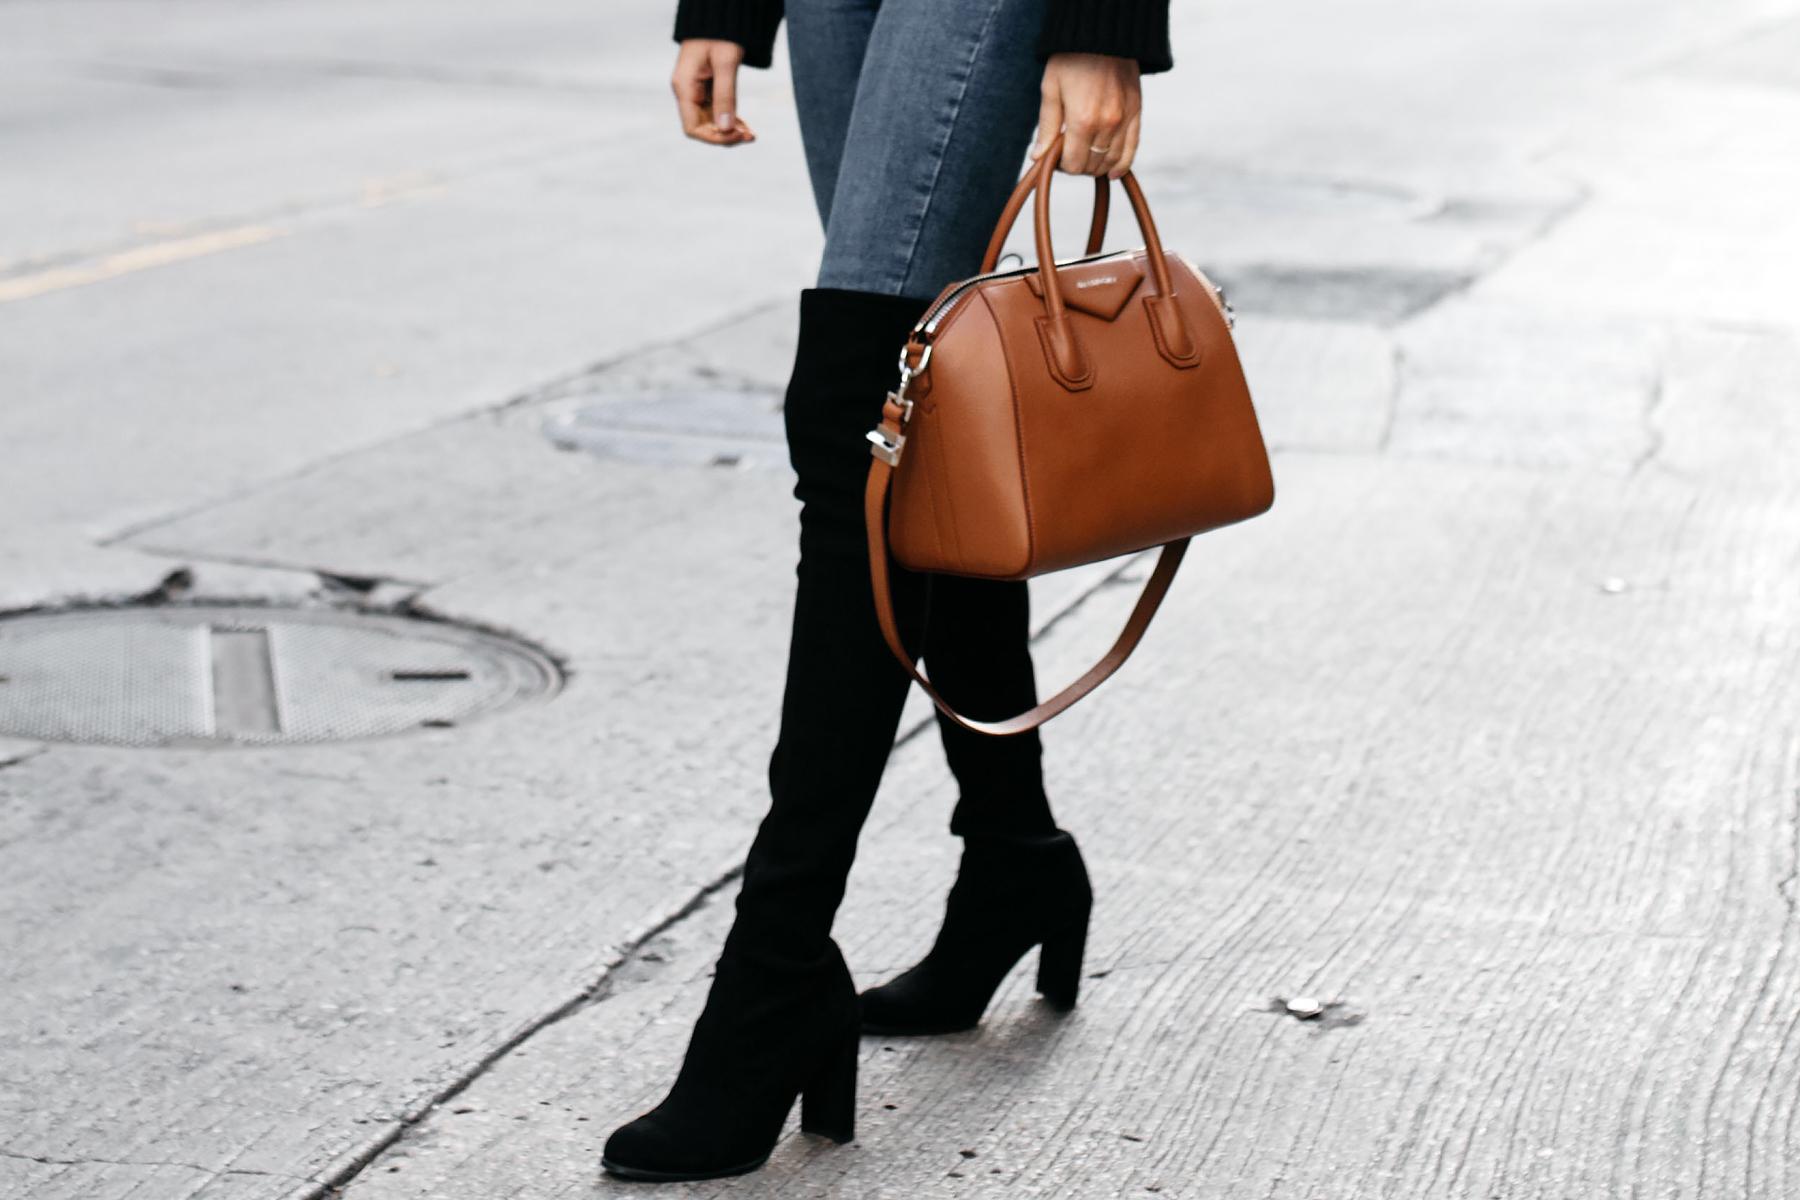 Givenchy Antigona Cognac Satchel Stuart Weitzman Over the Knee Boots Fashion Jackson Dallas Blogger Fashion Blogger Street Style